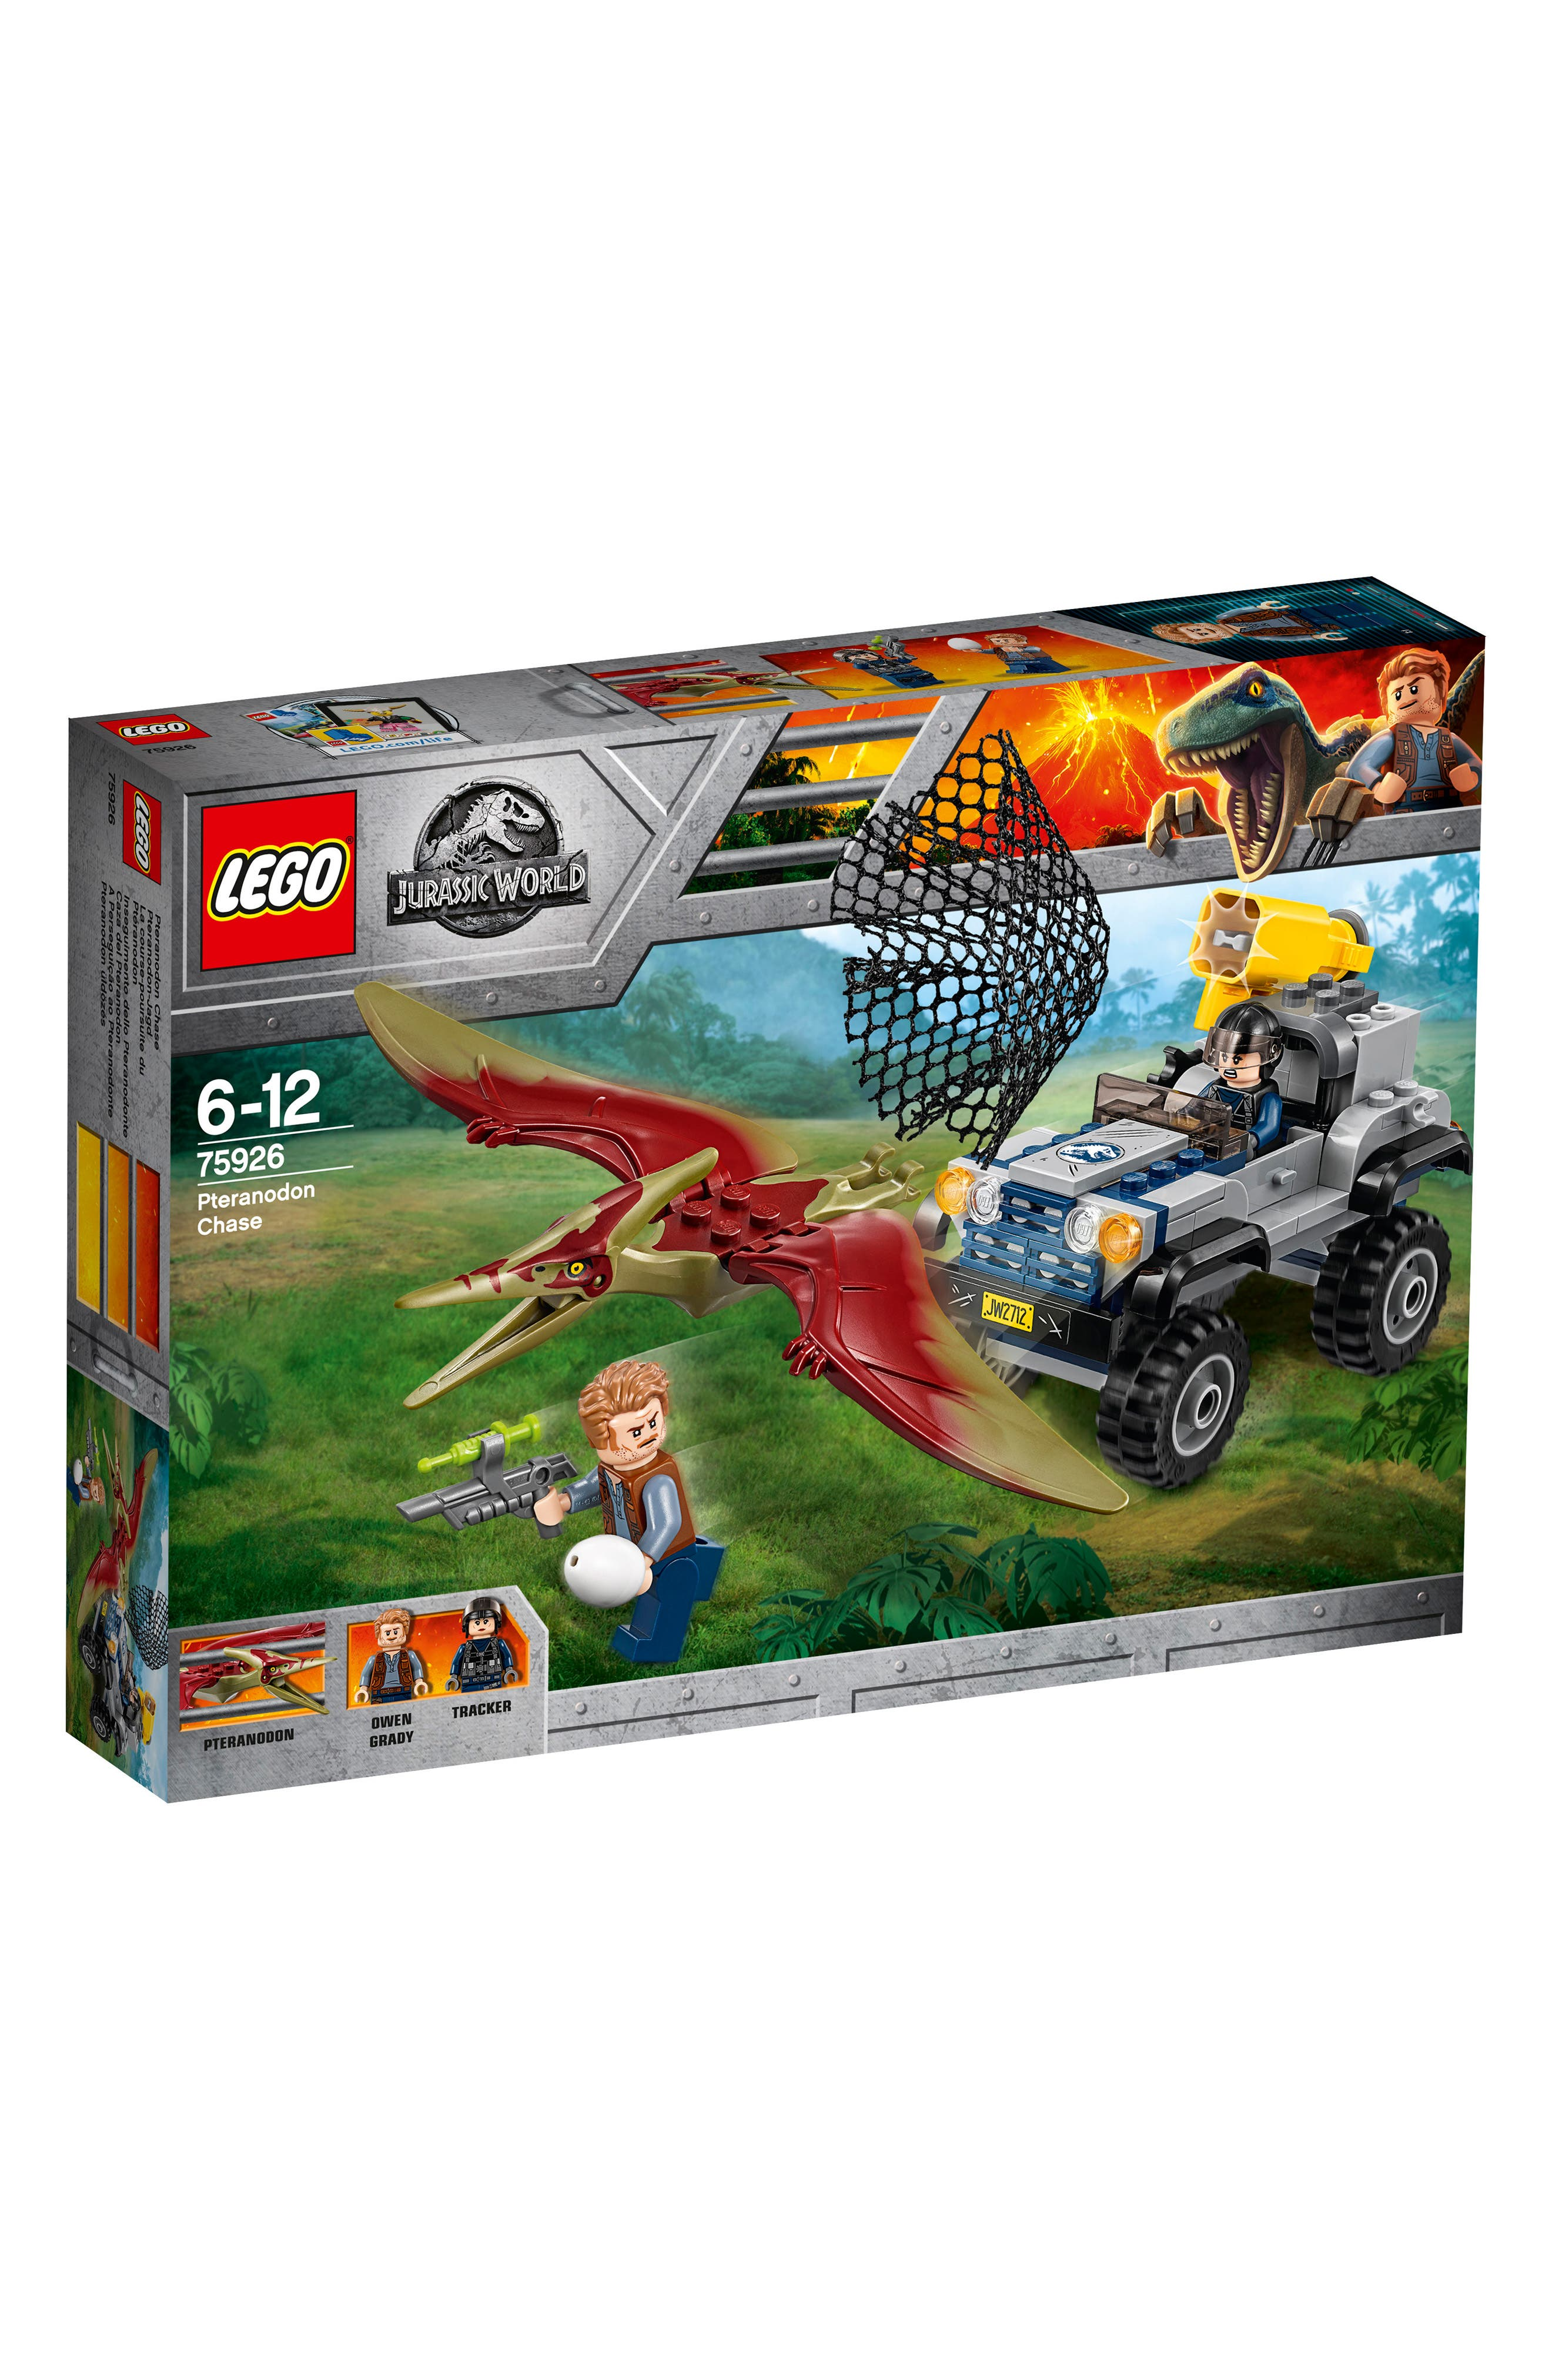 LEGO® Jurassic World™ Pteranodon Chase - 75926